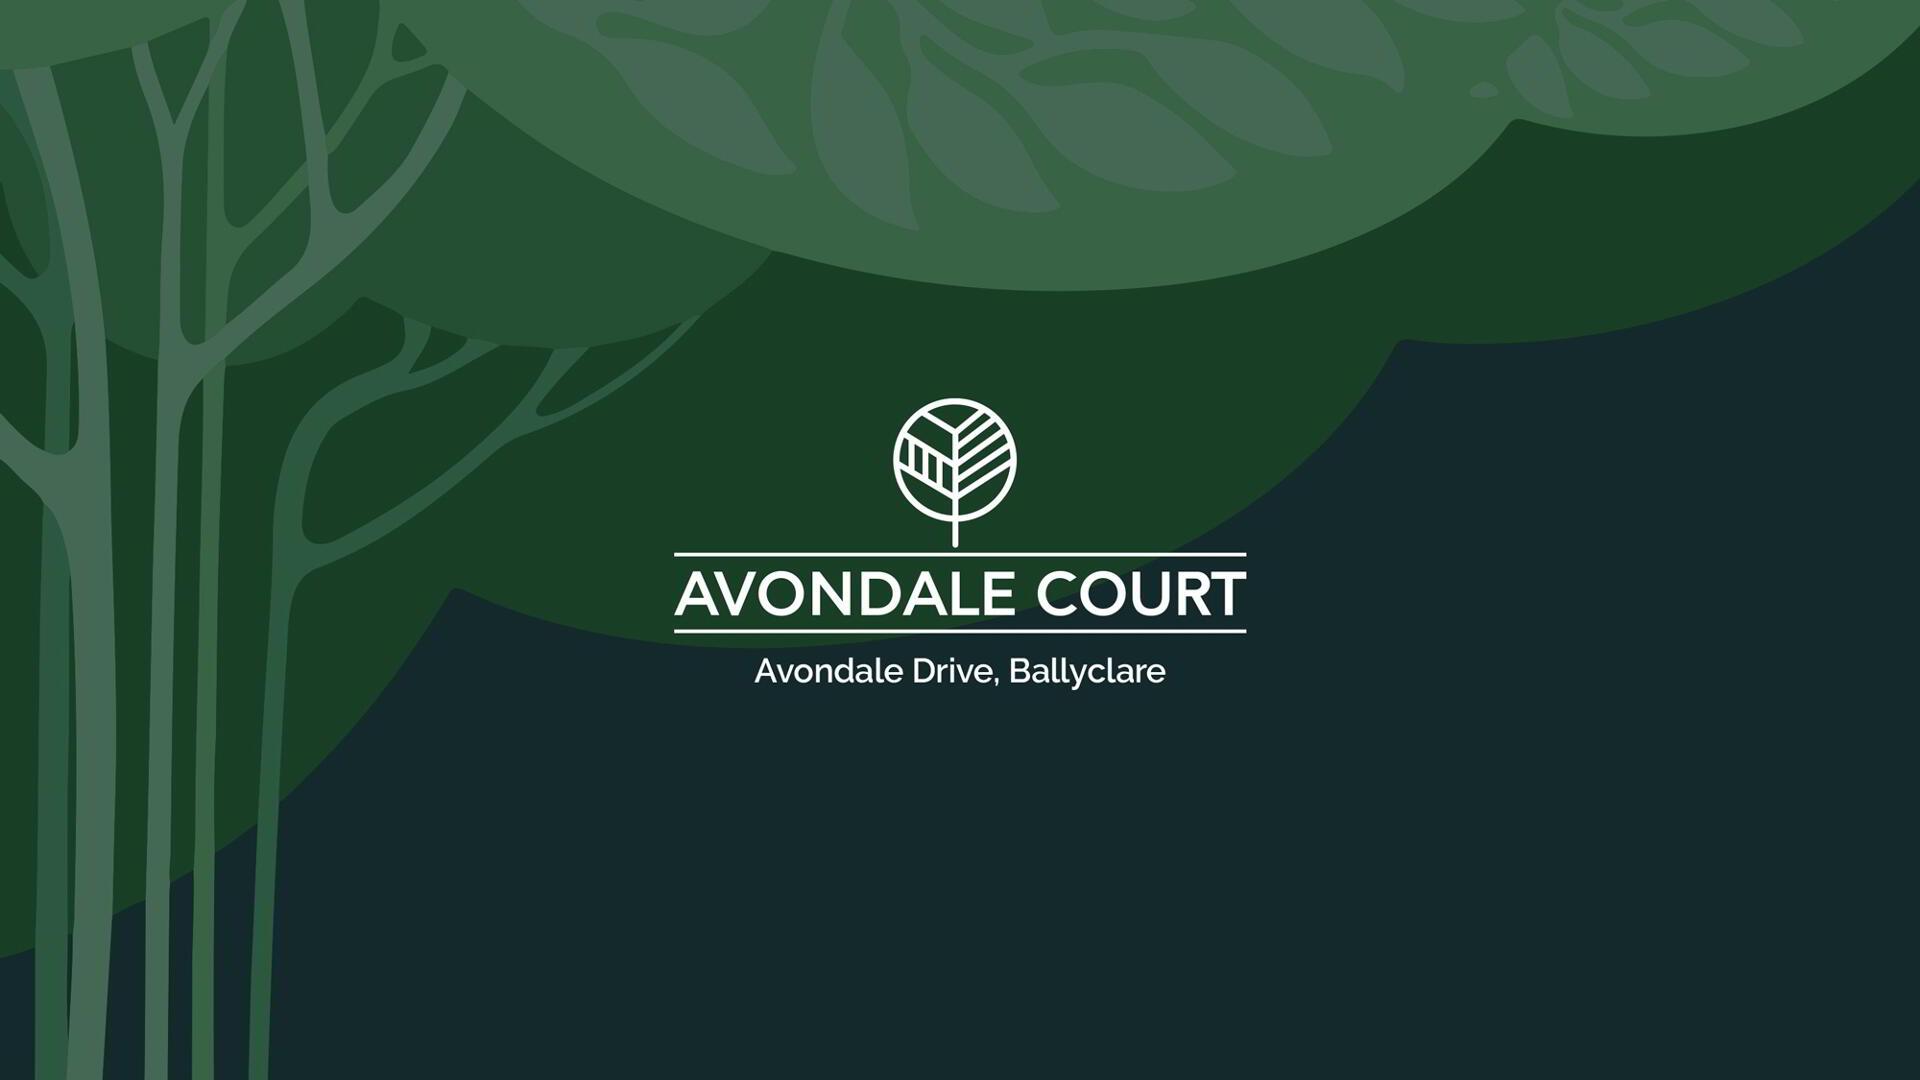 Avondale Court, Ballyclare